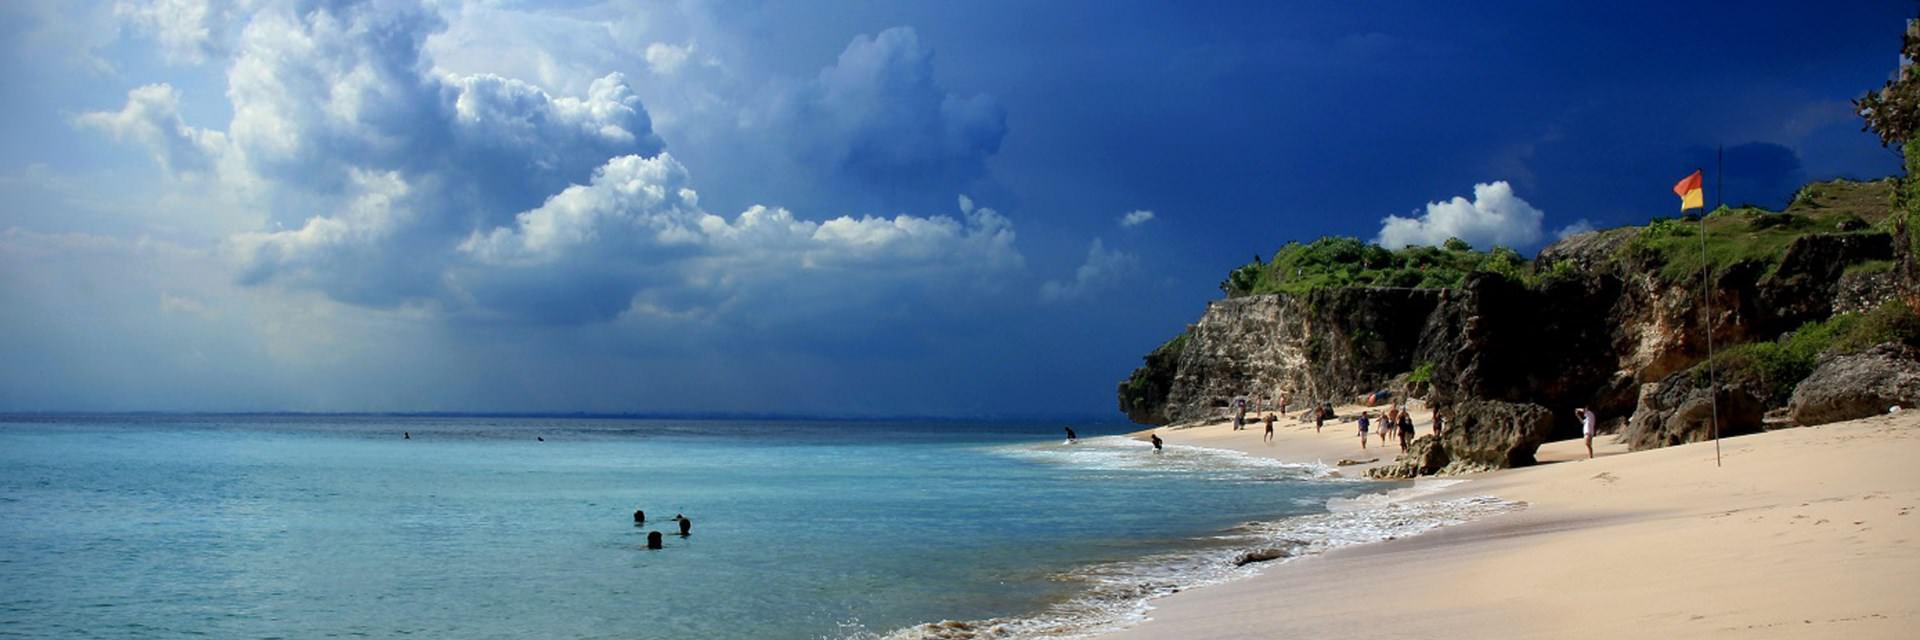 8 Wisata Alam Terbaik Denpasar - Dolan Dolen